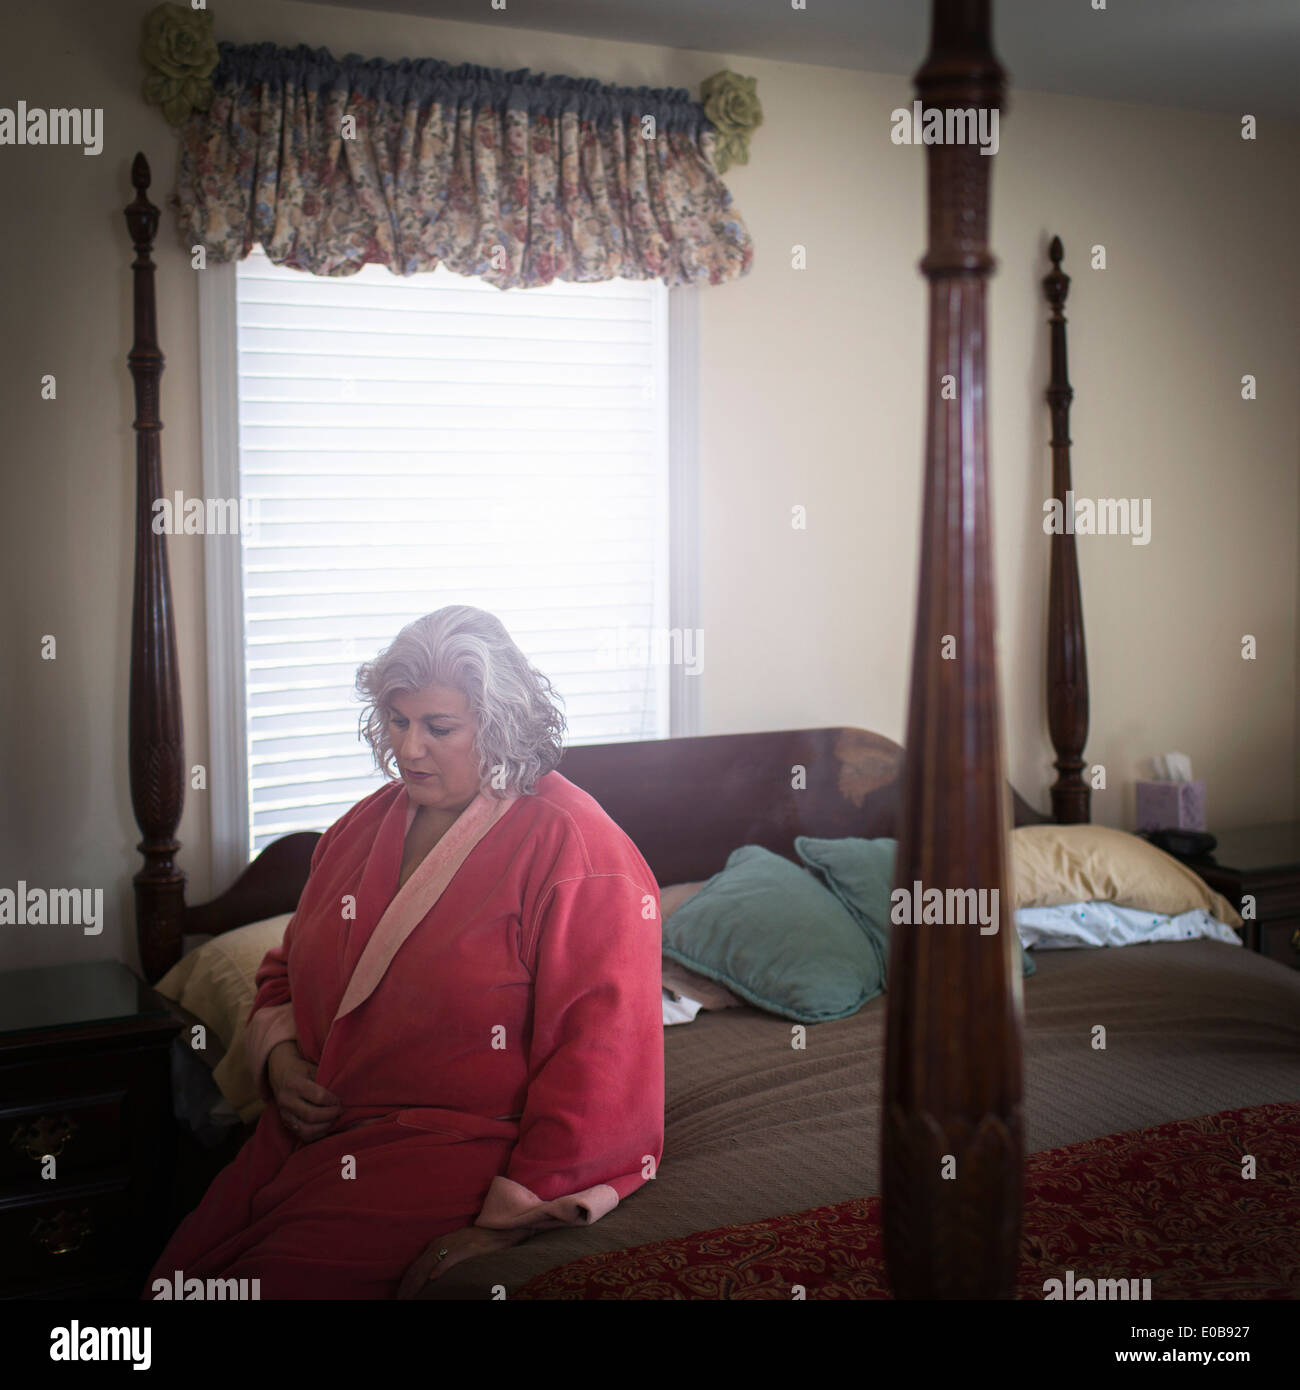 Malheureux mature woman sitting on bed Photo Stock